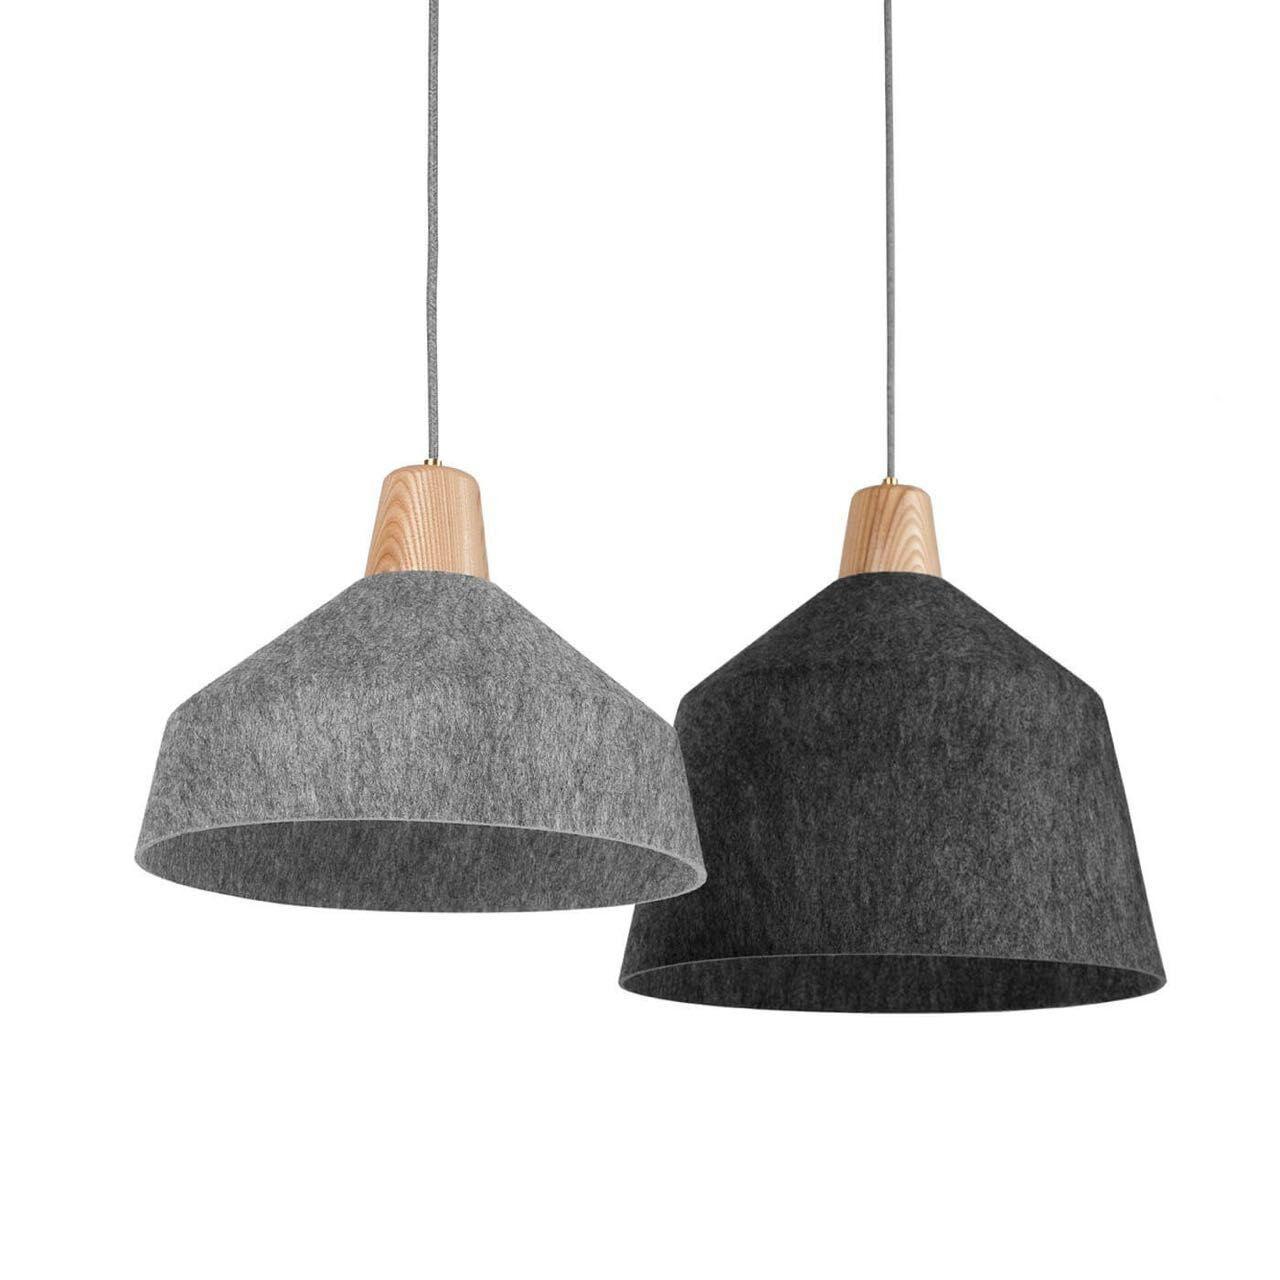 Acoustic Light Cap Light Objects Design Pendant Light